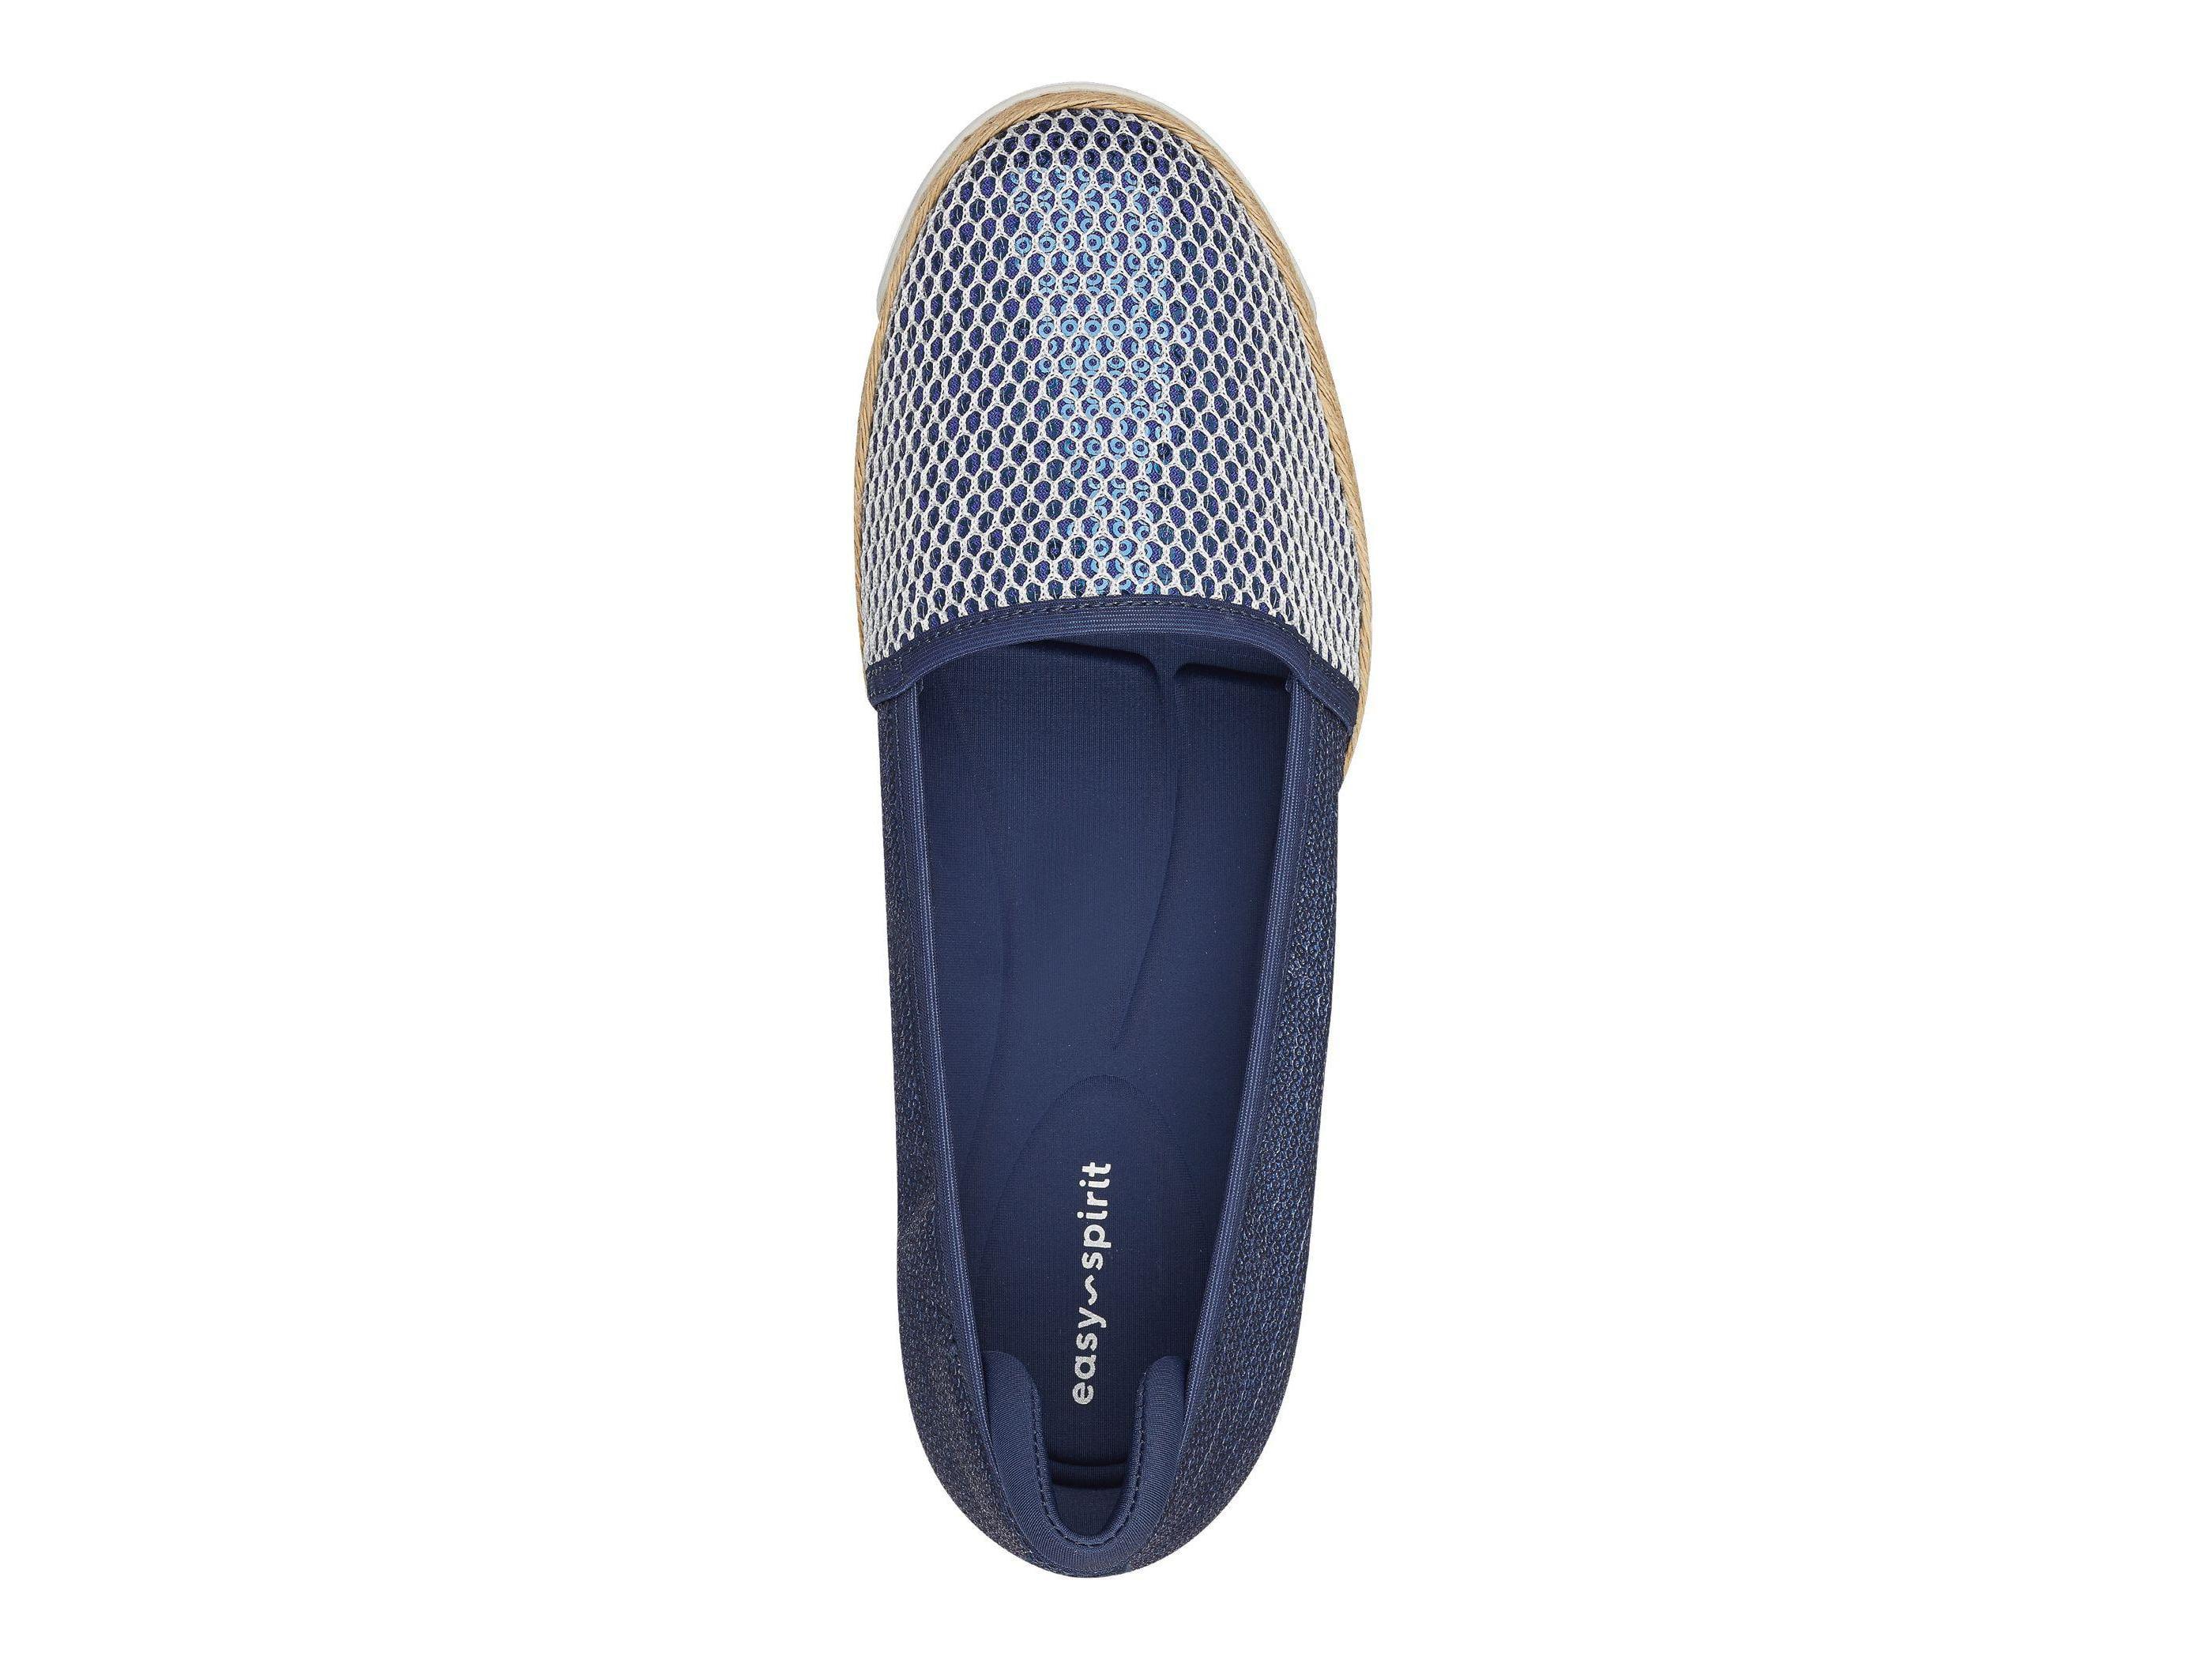 6d5e04f3182d Easy Spirit Womens Portnia Closed Toe Casual Espadrille Sandals